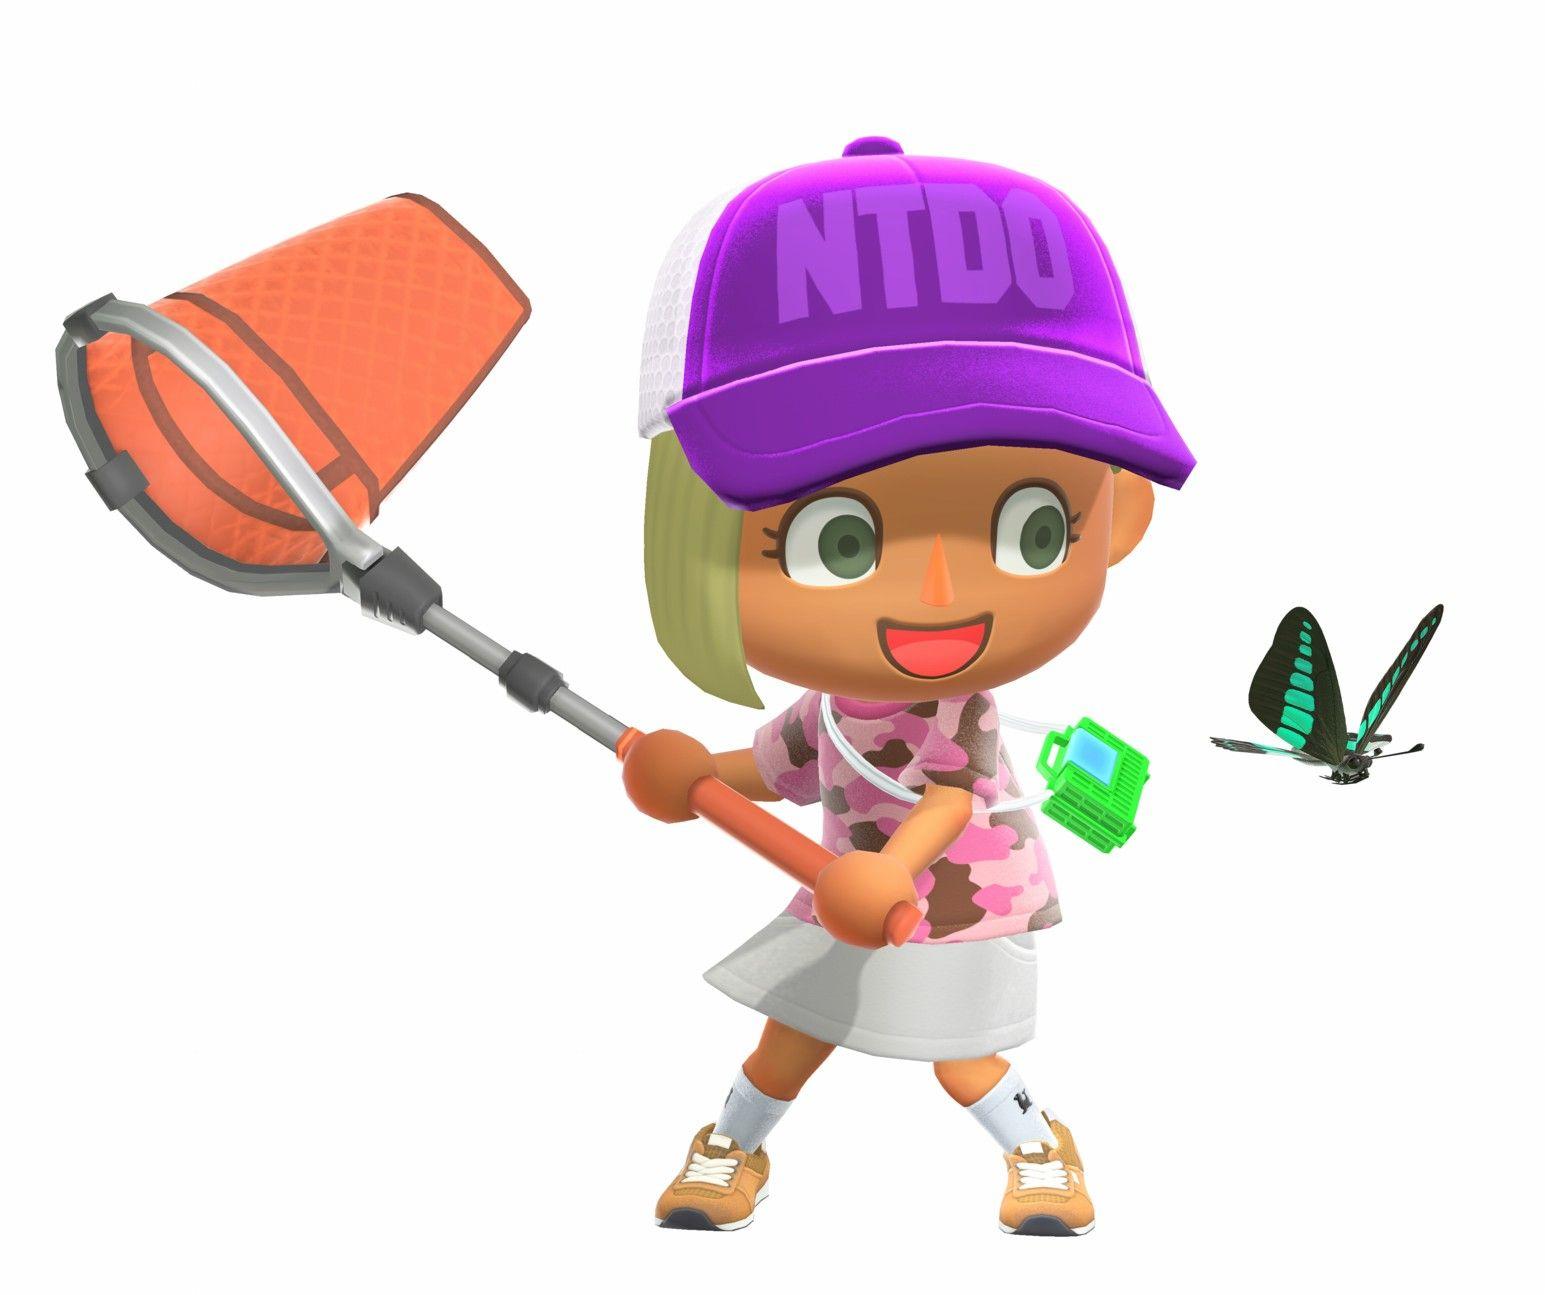 Animal Crossing New Horizons Art In 2020 Animal Crossing Animal Crossing Characters New Animal Crossing